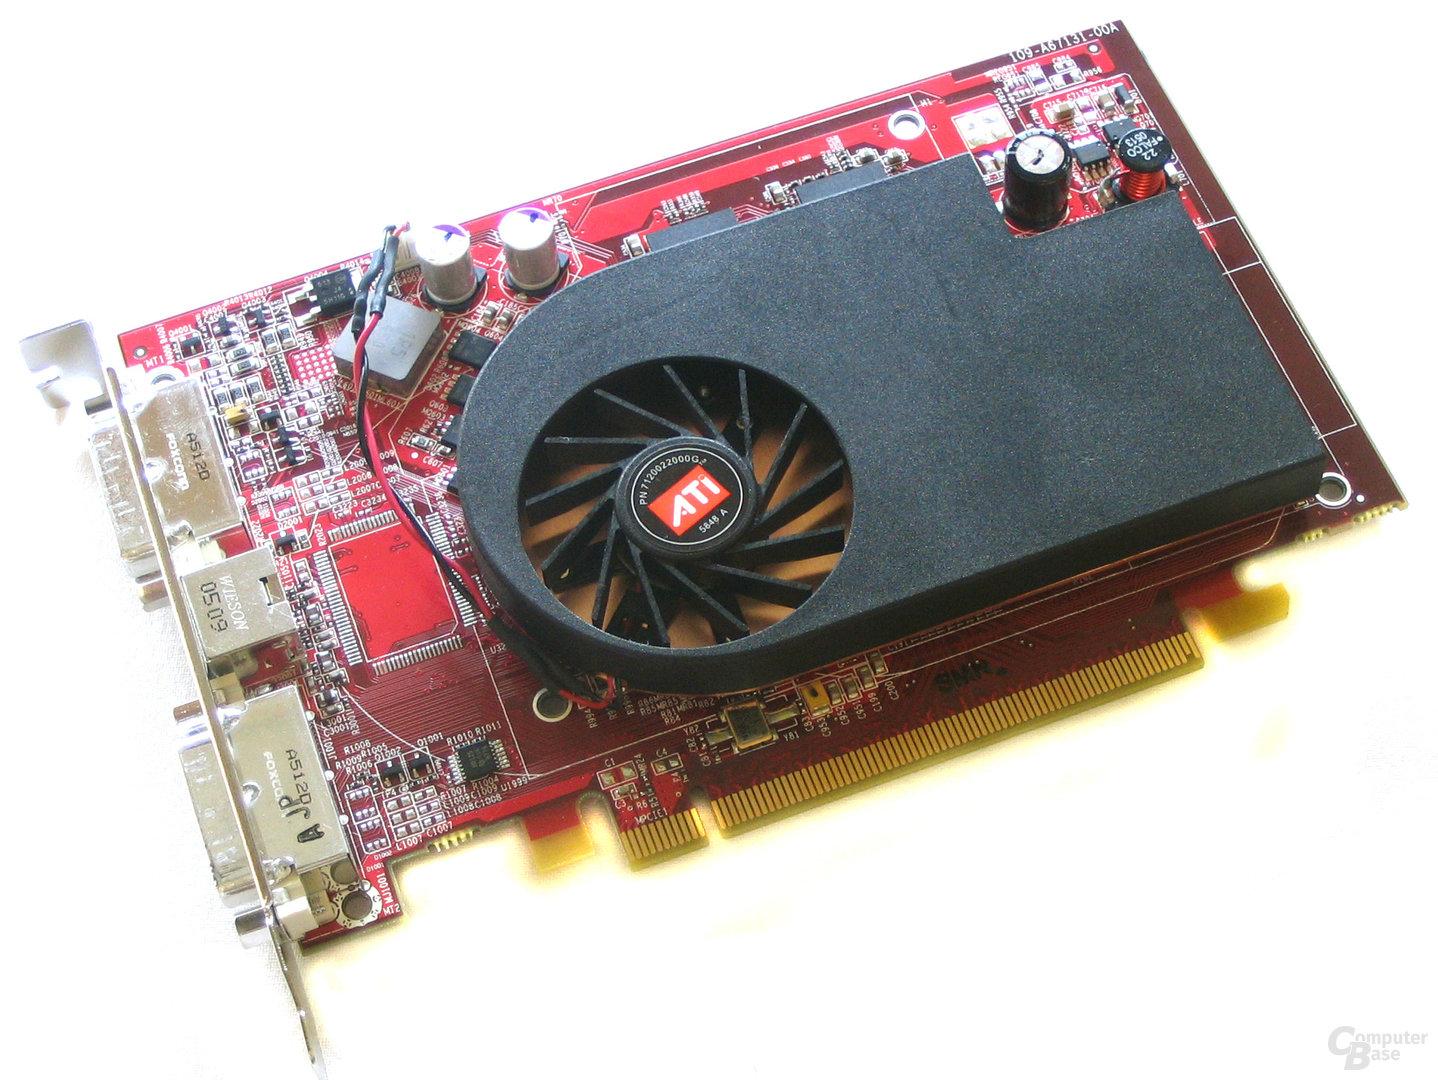 Radeon X1600 XT